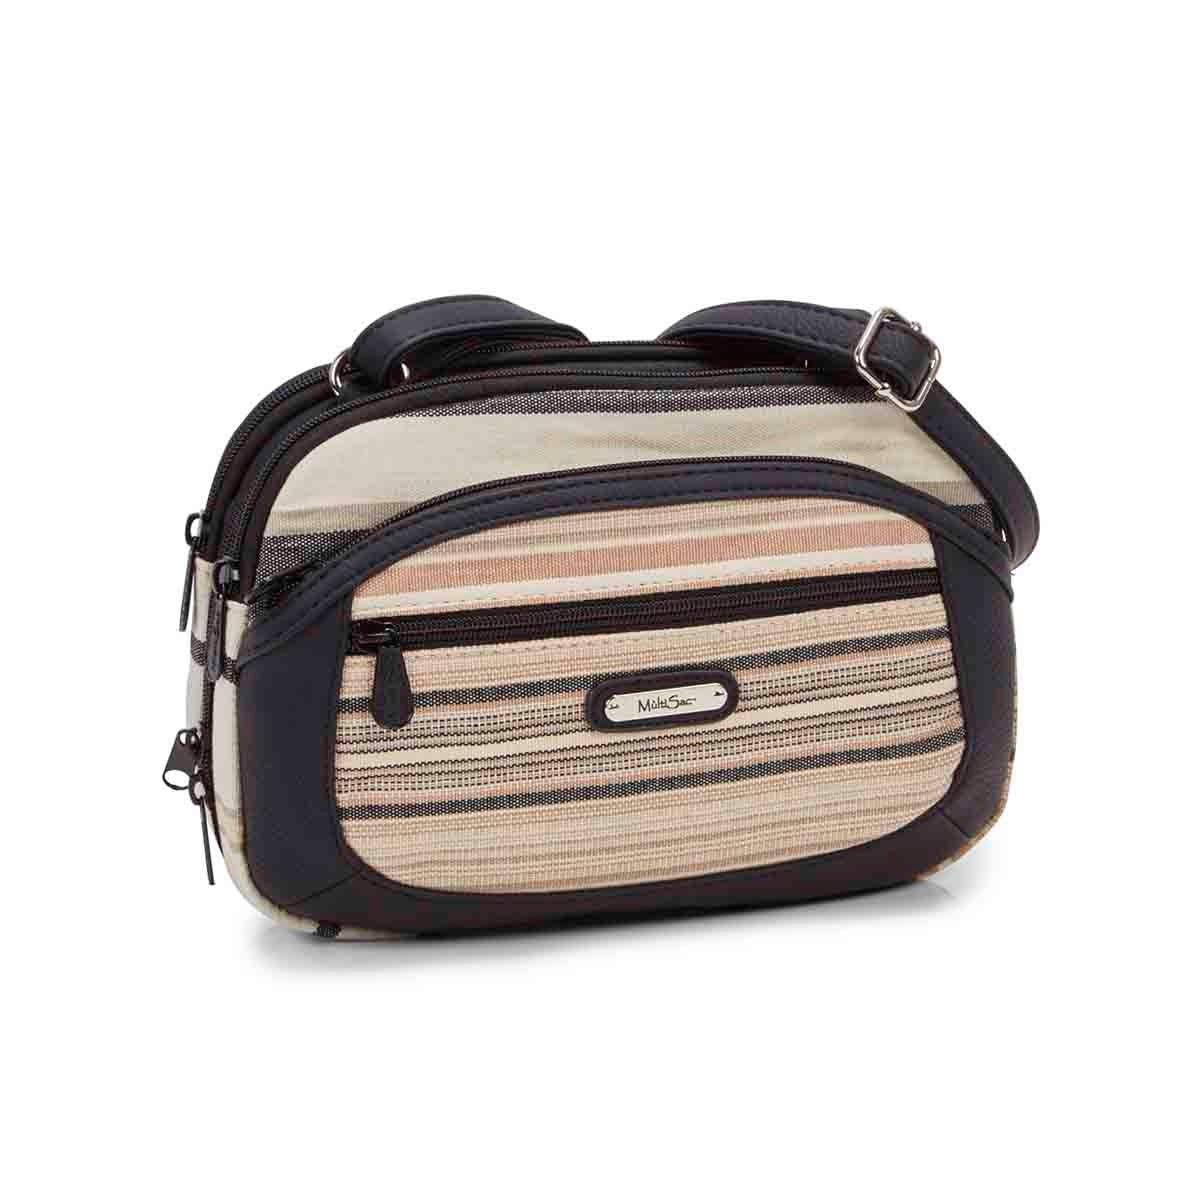 Women's TERABYTE natural/black crossbody bag